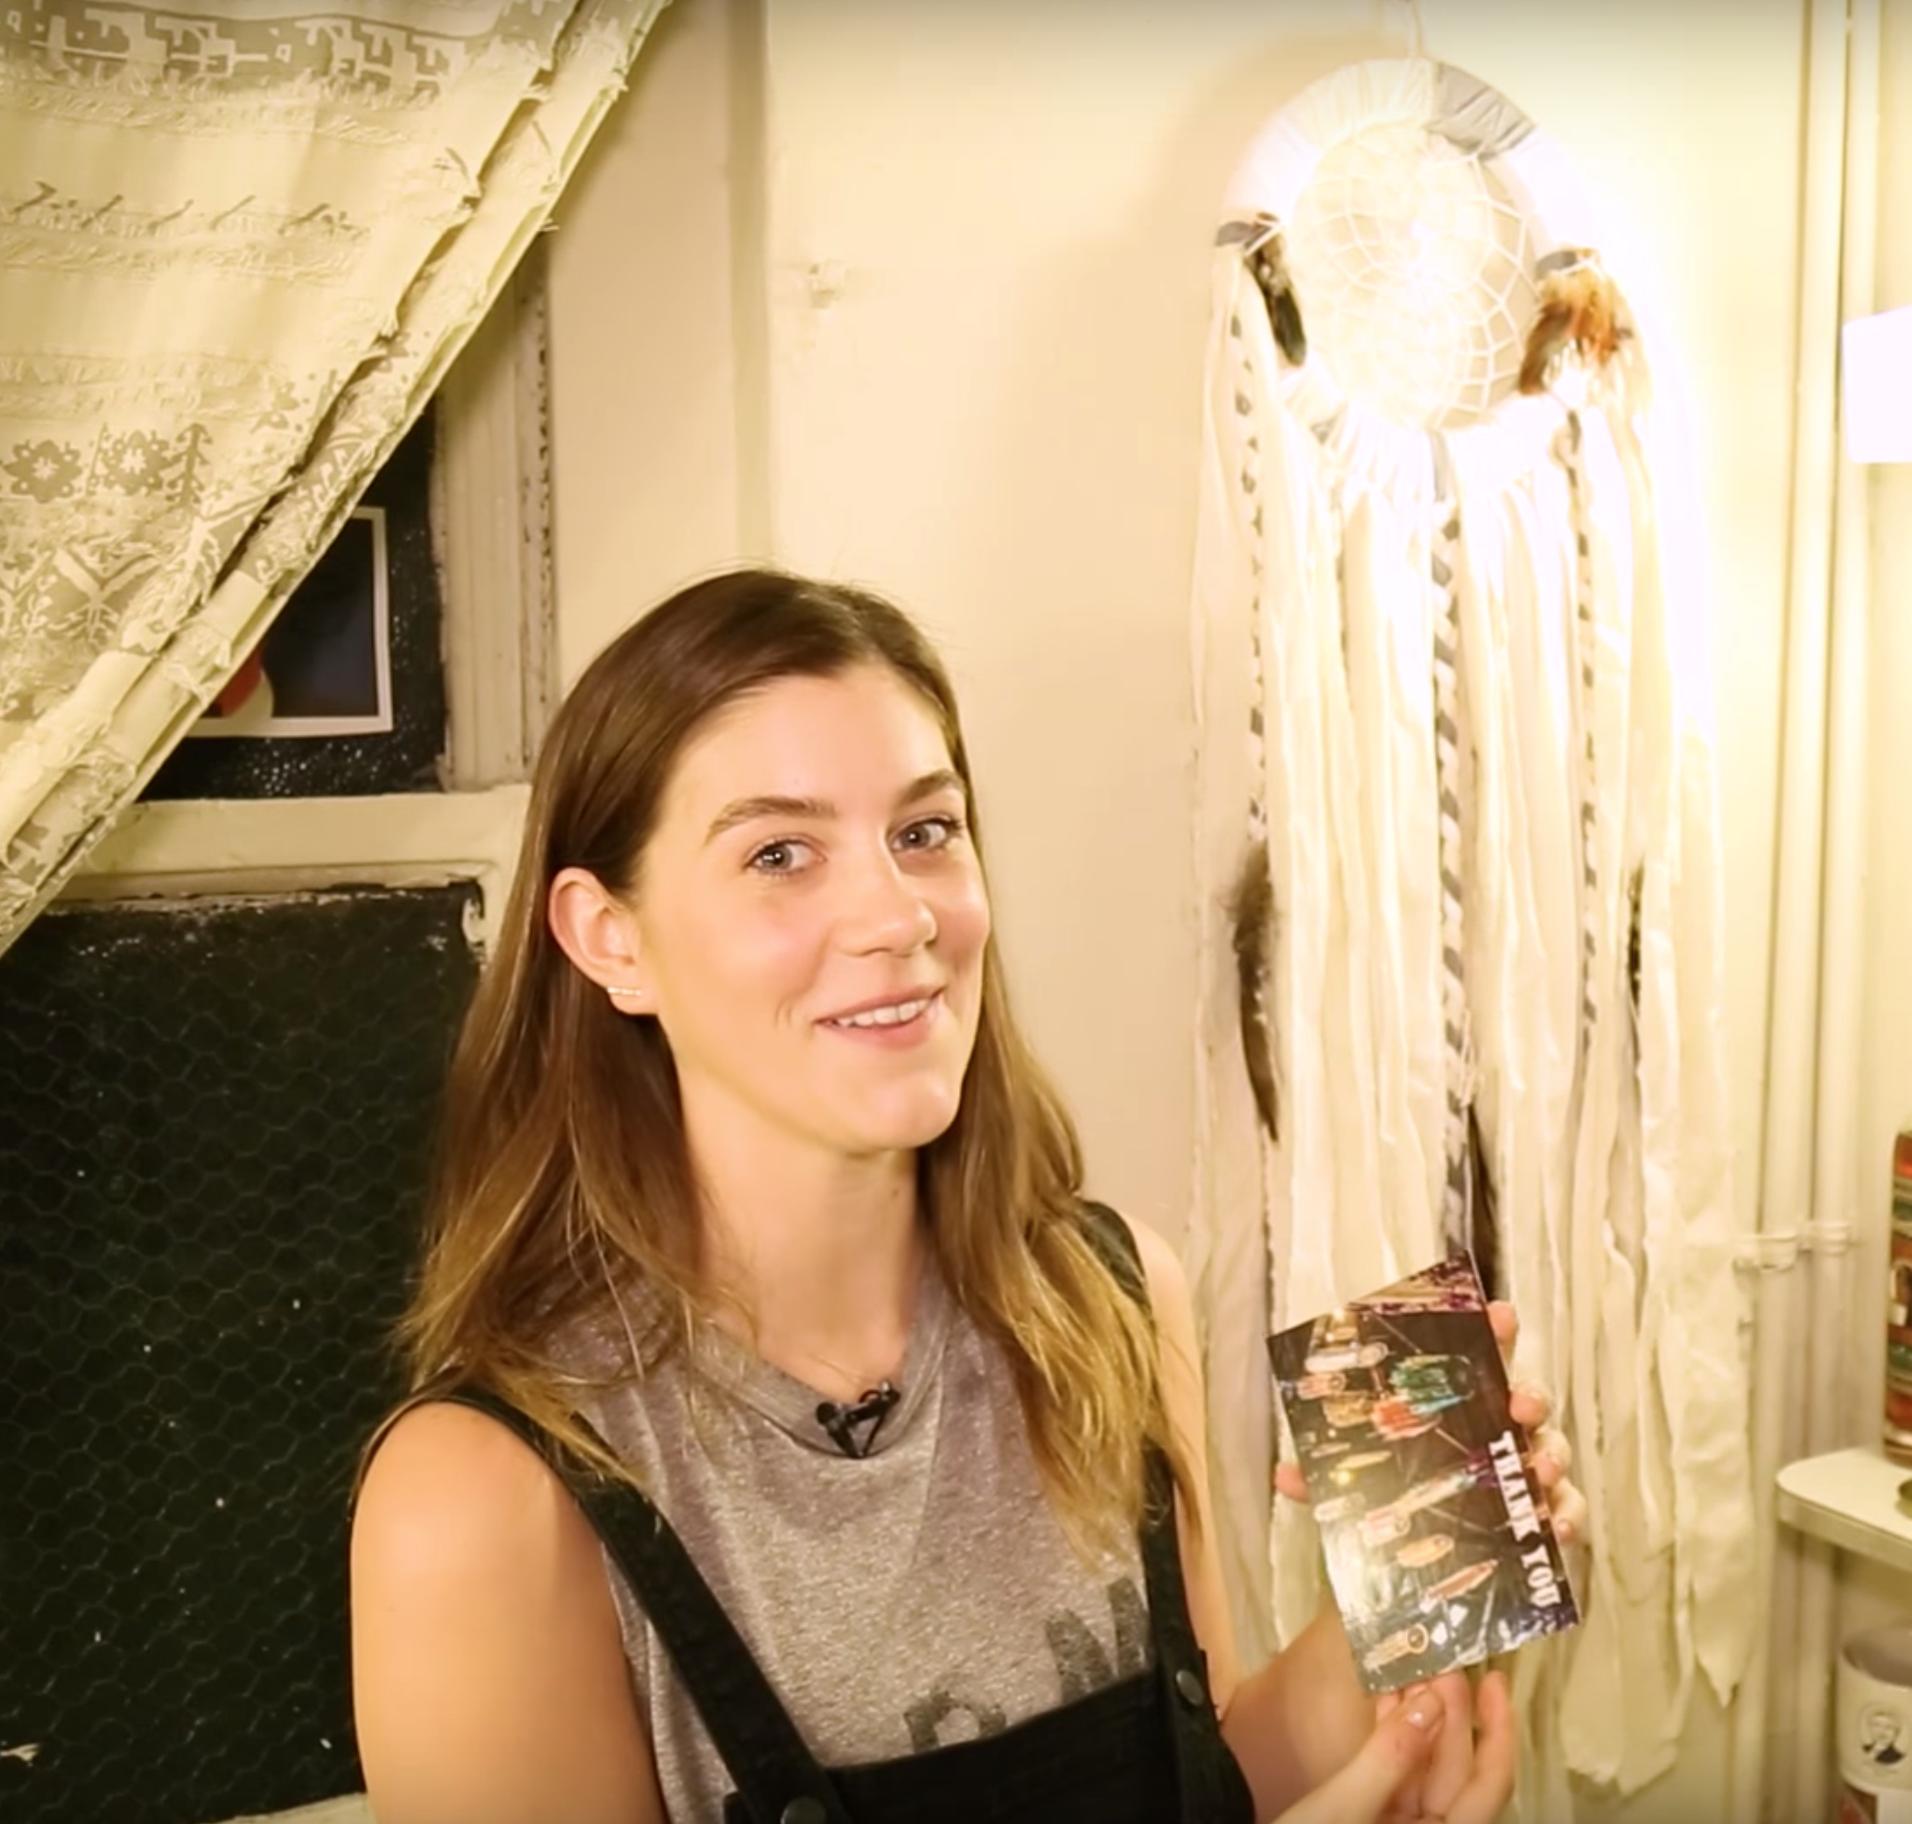 Broadway.com -My Space: Laura Dreyfuss of DEAR EVAN HANSEN - SpokeWoven dreamcatcher #1 of her 5 favorite things in her dressing room